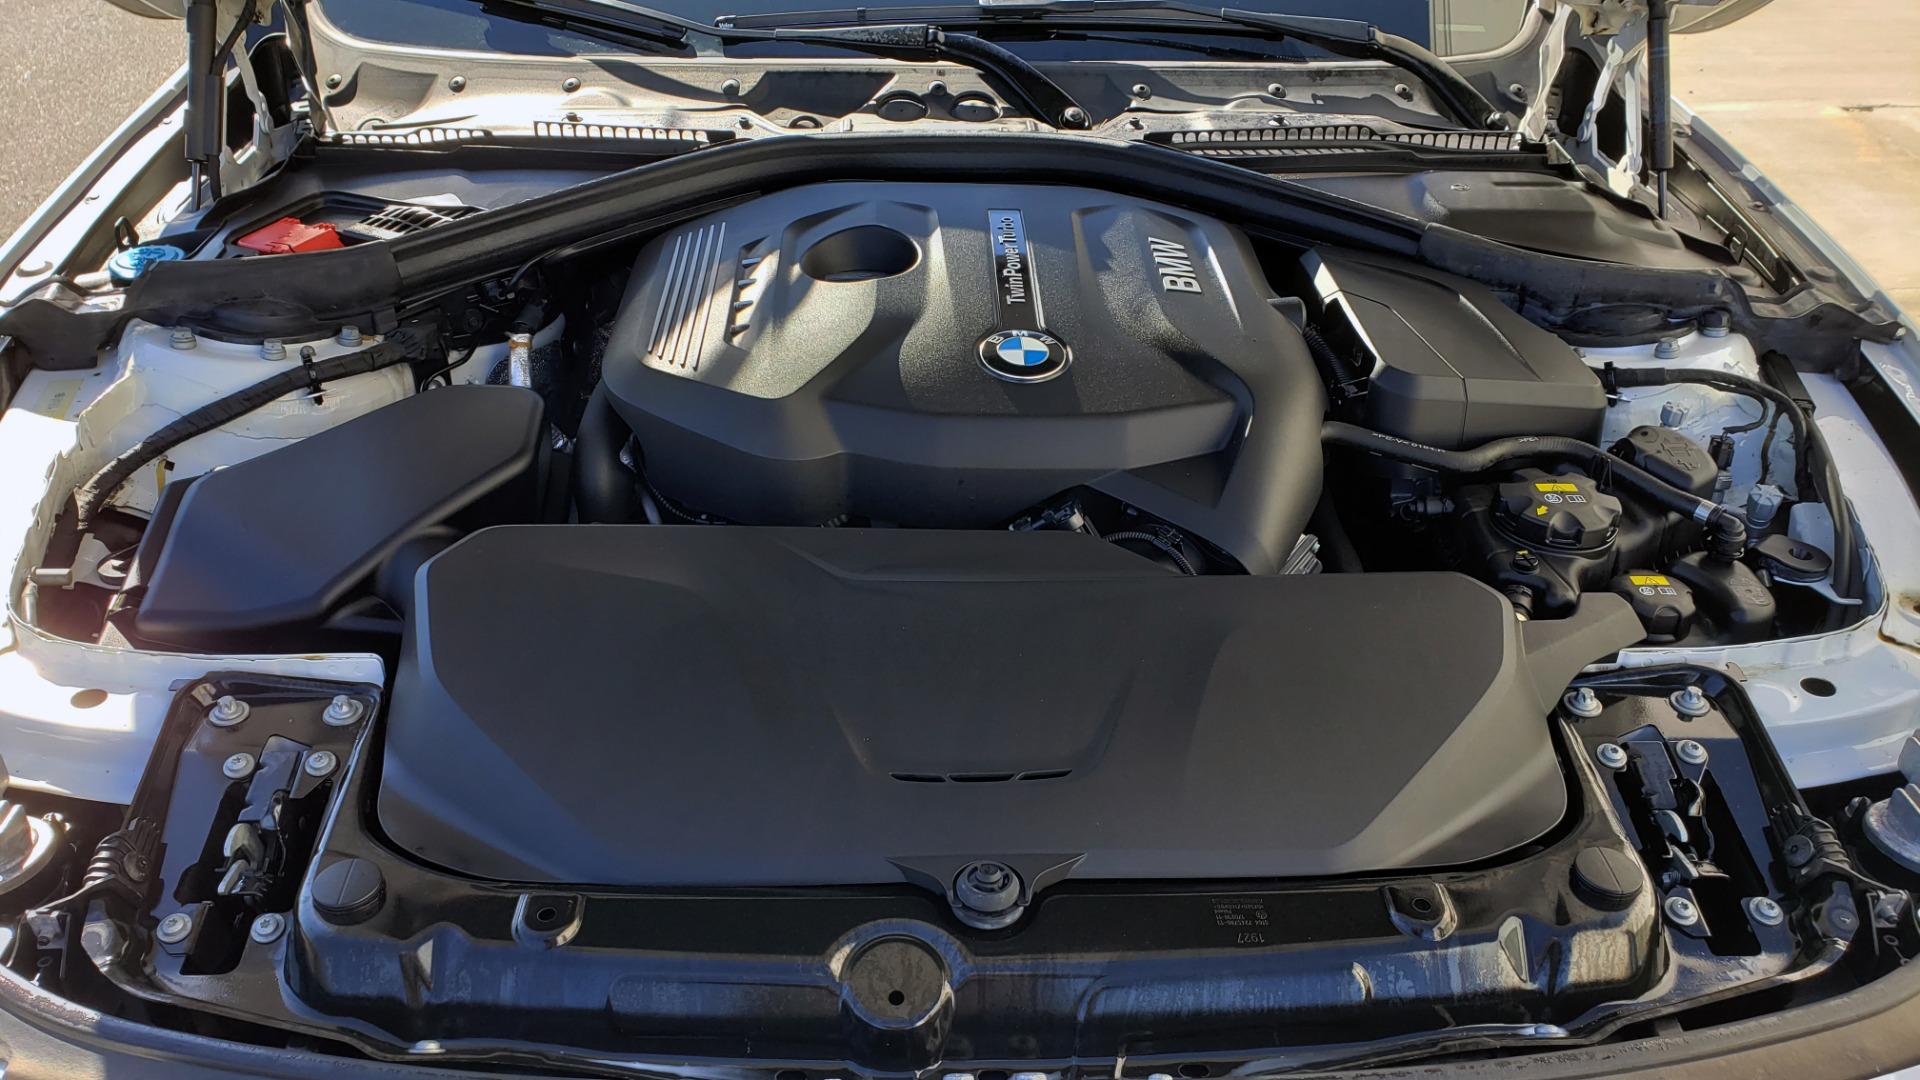 Used 2018 BMW 4 SERIES 430IXDRIVE / PREMIUM / NAV / SUNROOF / ESSENTIALS PKG for sale $27,795 at Formula Imports in Charlotte NC 28227 13